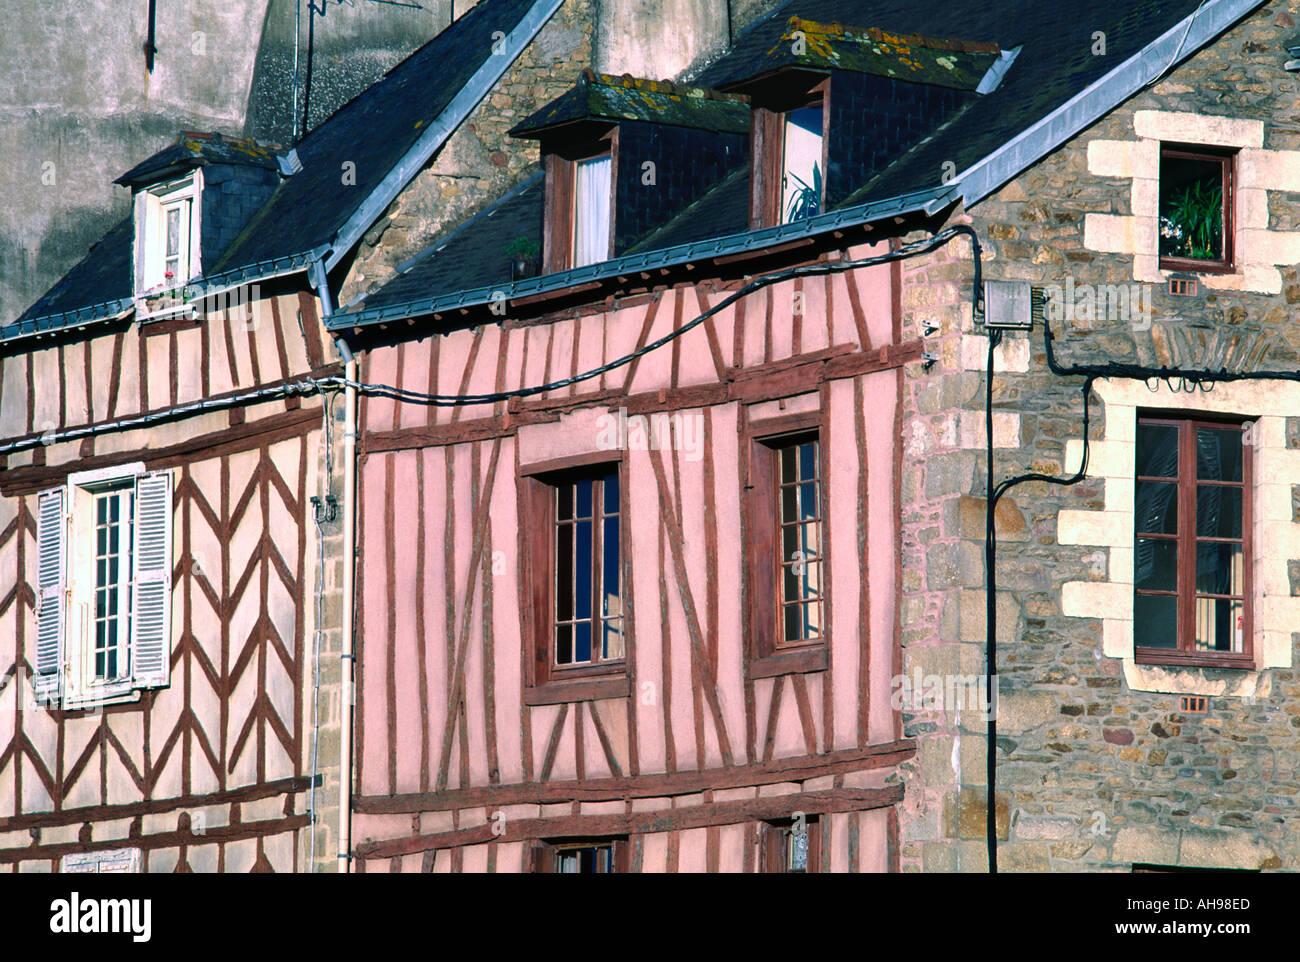 Medieval House Exterior Stock Photos & Medieval House Exterior Stock ...